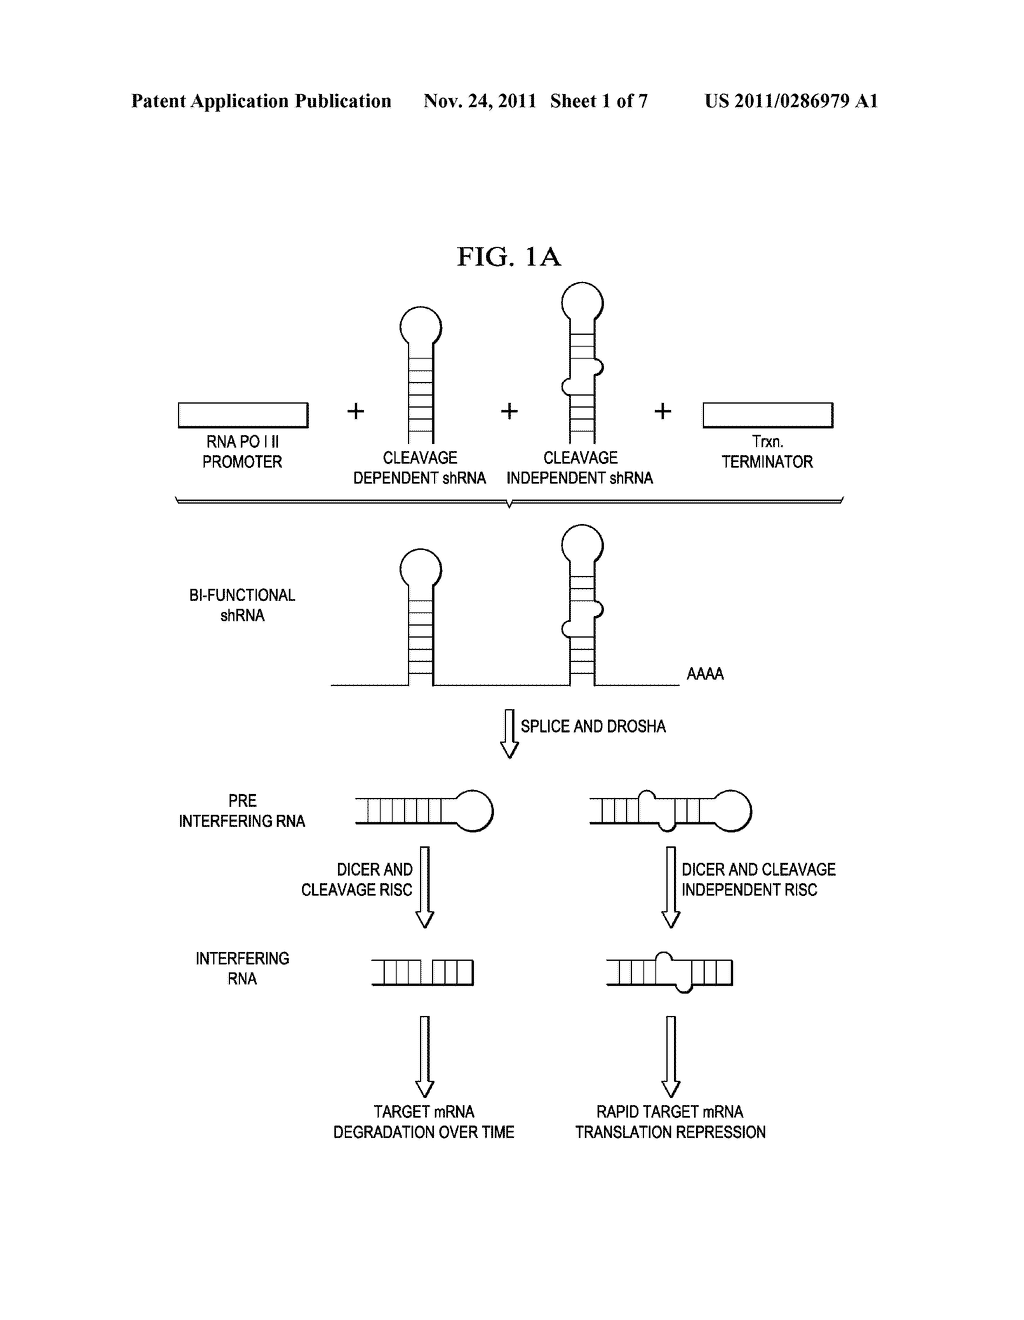 hairpin rna diagram box wiring diagram RNA Molecule chemosensitization by bi functional small hairpin rna bi shrna hairpin rna virus hairpin rna diagram